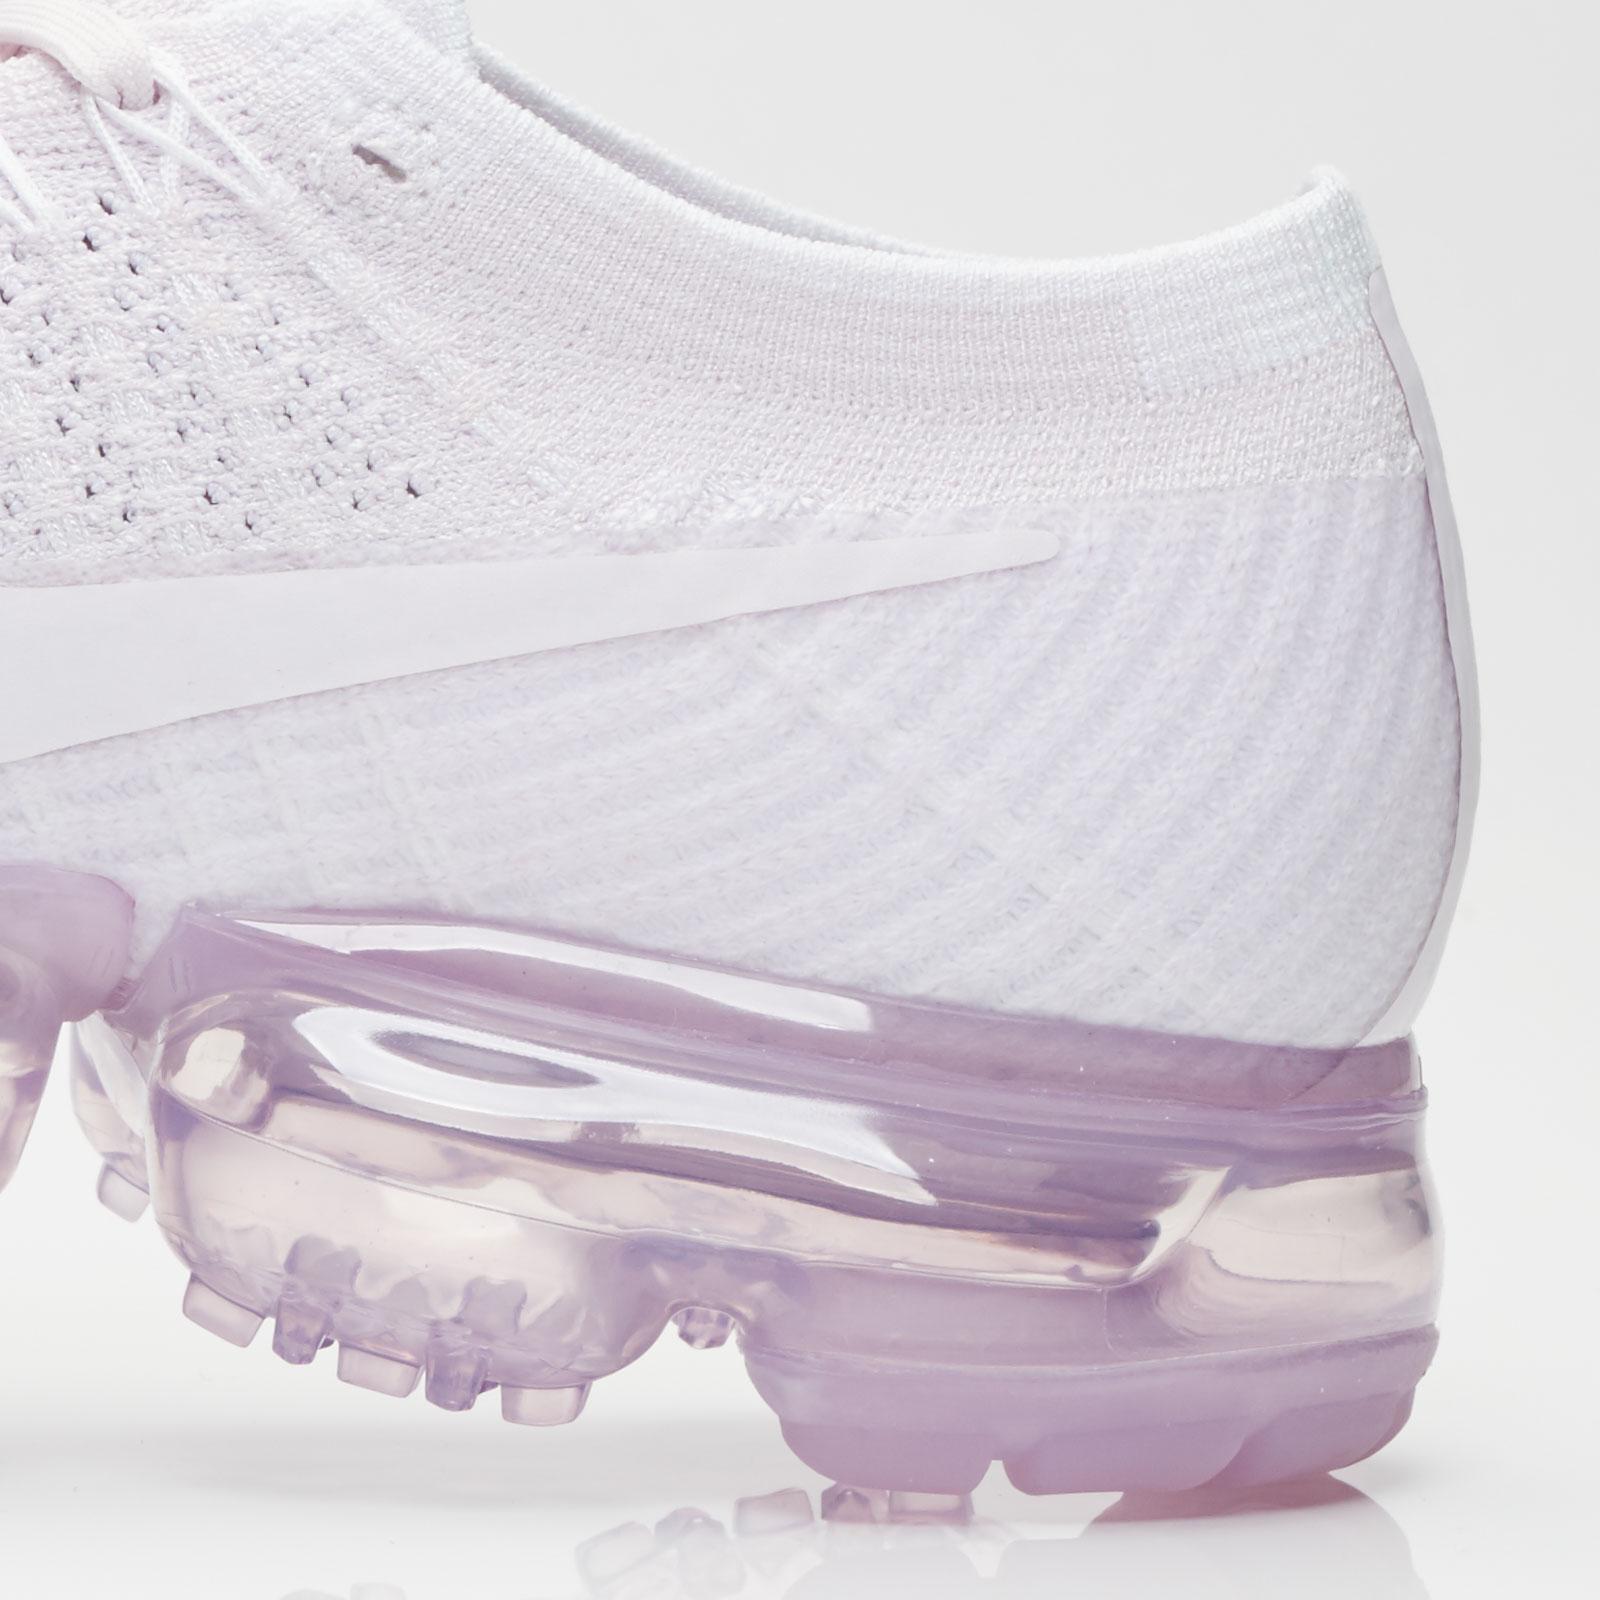 Nike Wmns Air Vapormax Flyknit - 849557-501 - Sneakersnstuff ... 8b7212b64c